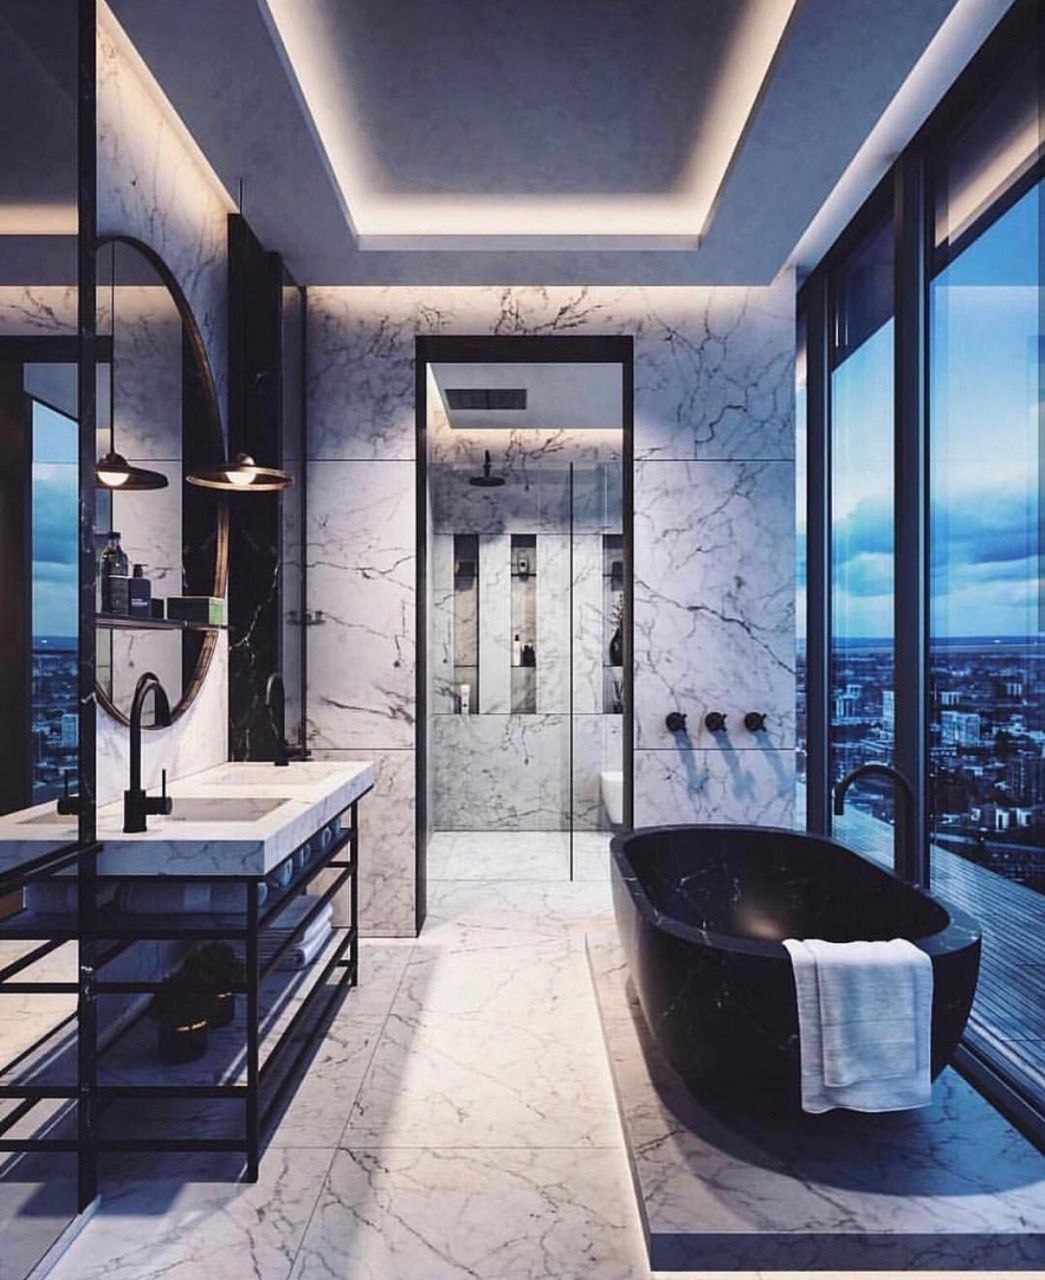 luxuryprorsum u201c Luxury Prorsum luxuryprorsumtumblrcom